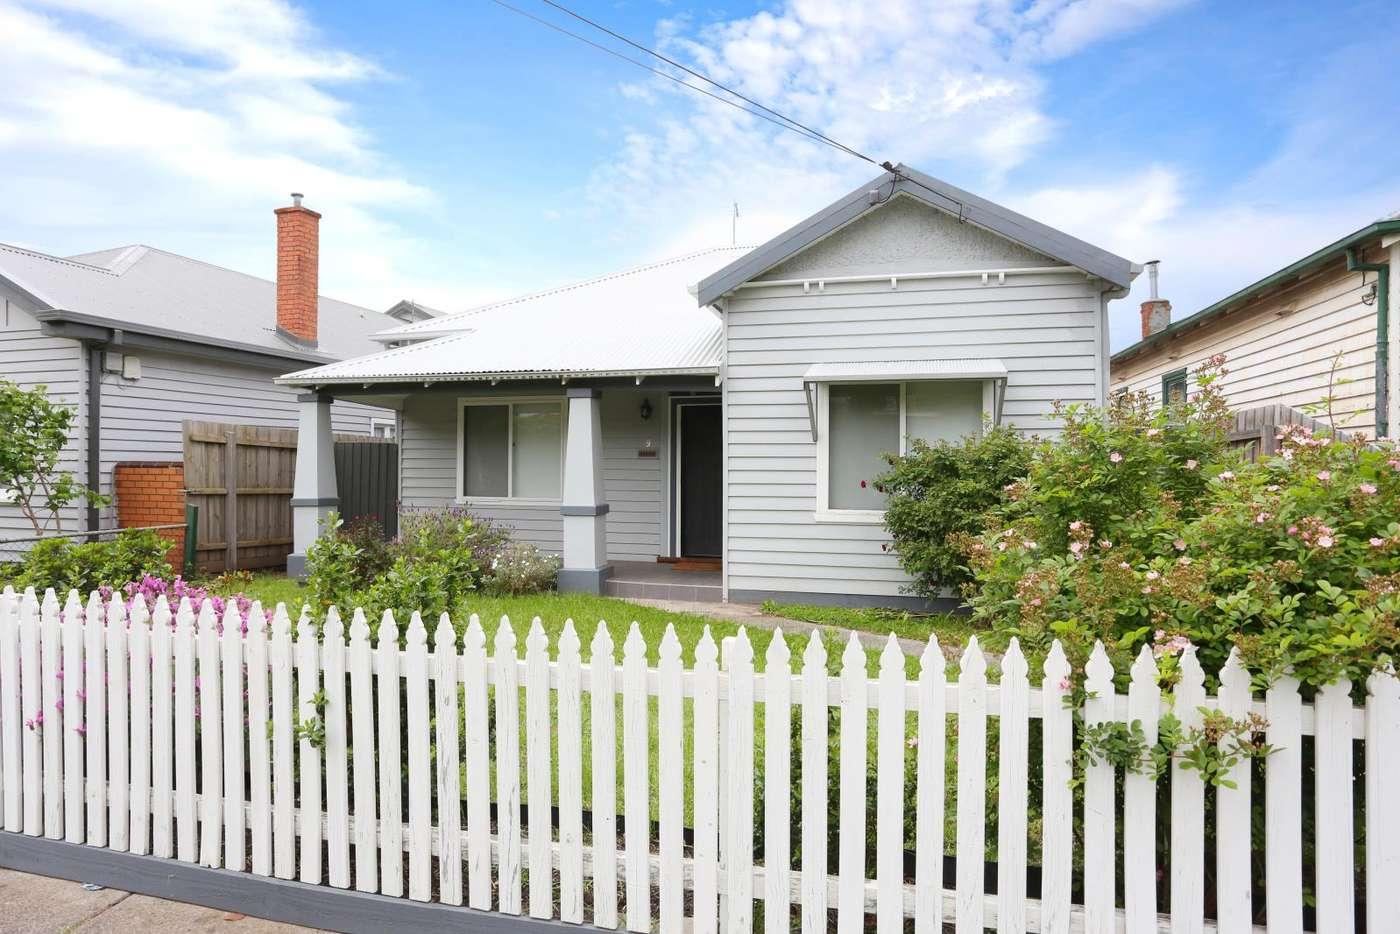 Main view of Homely house listing, 9 Salisbury Street, Coburg VIC 3058